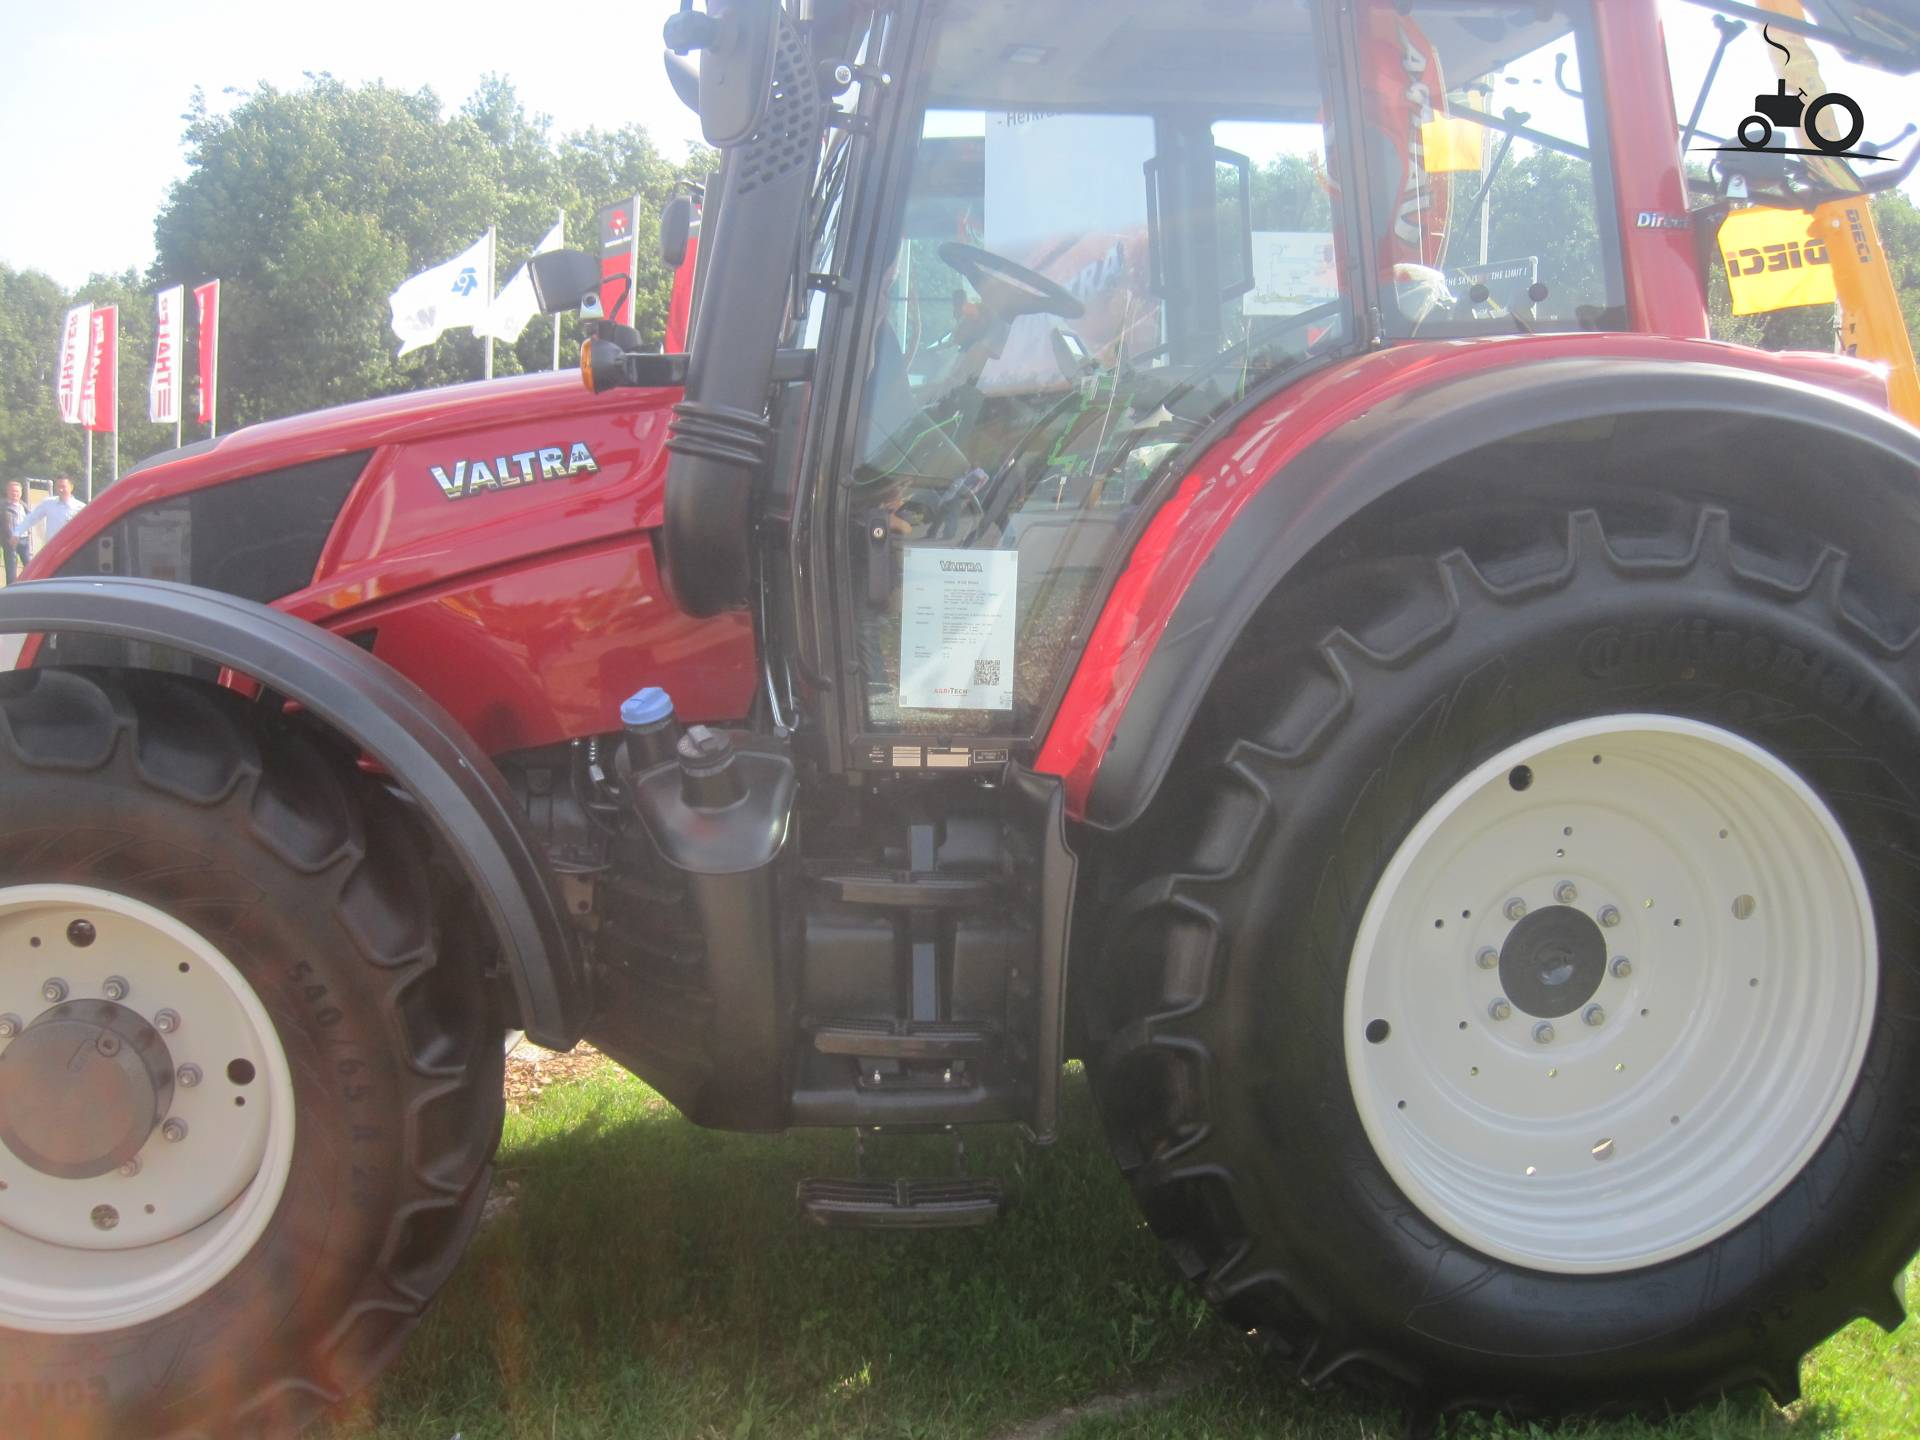 Valtra N163 Direct